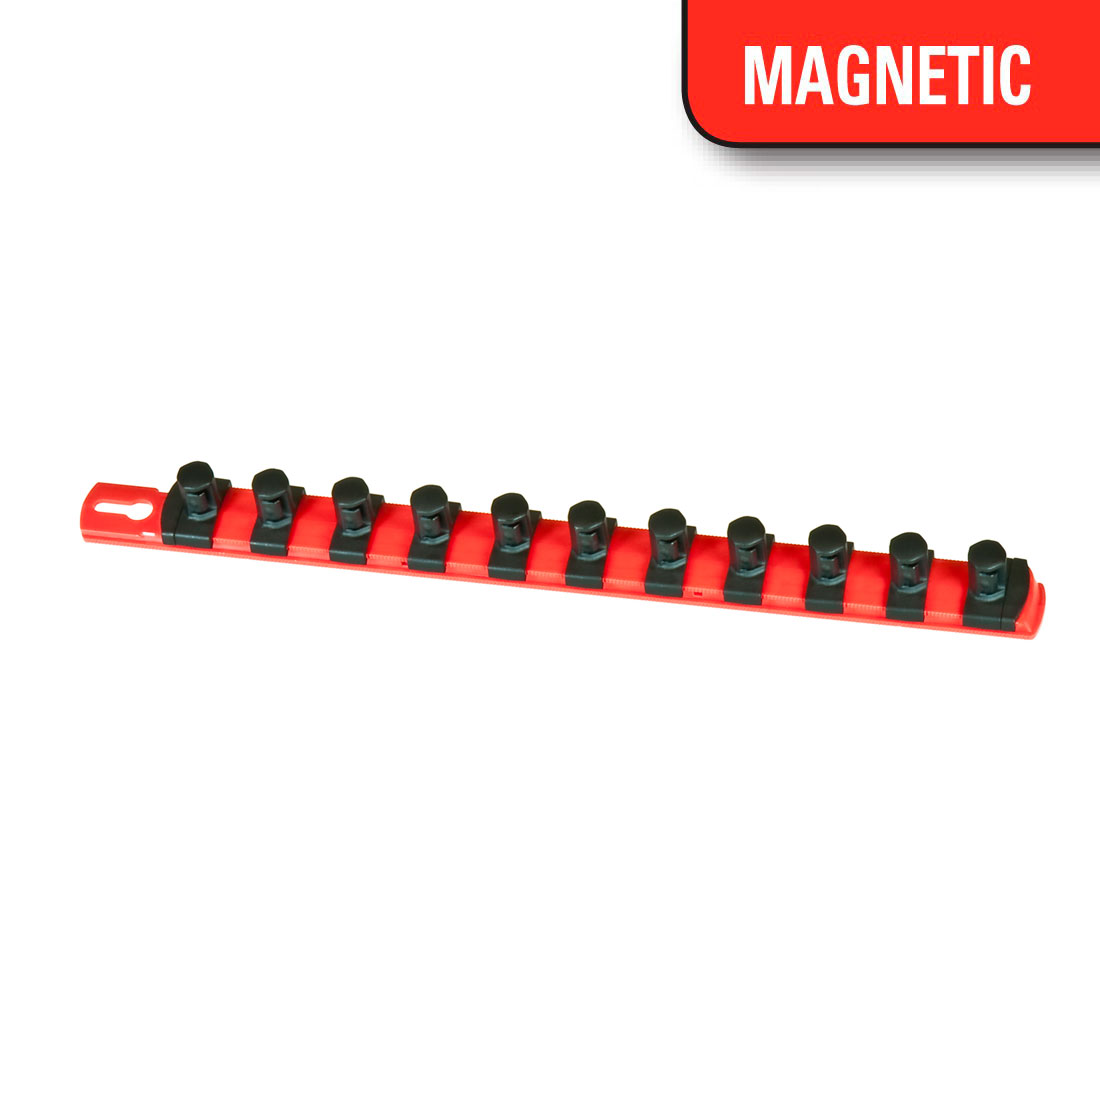 13-Inch Red Ernst Manufacturing Socket Boss 2-Rail 1//4-Inch-Drive Socket Organizer